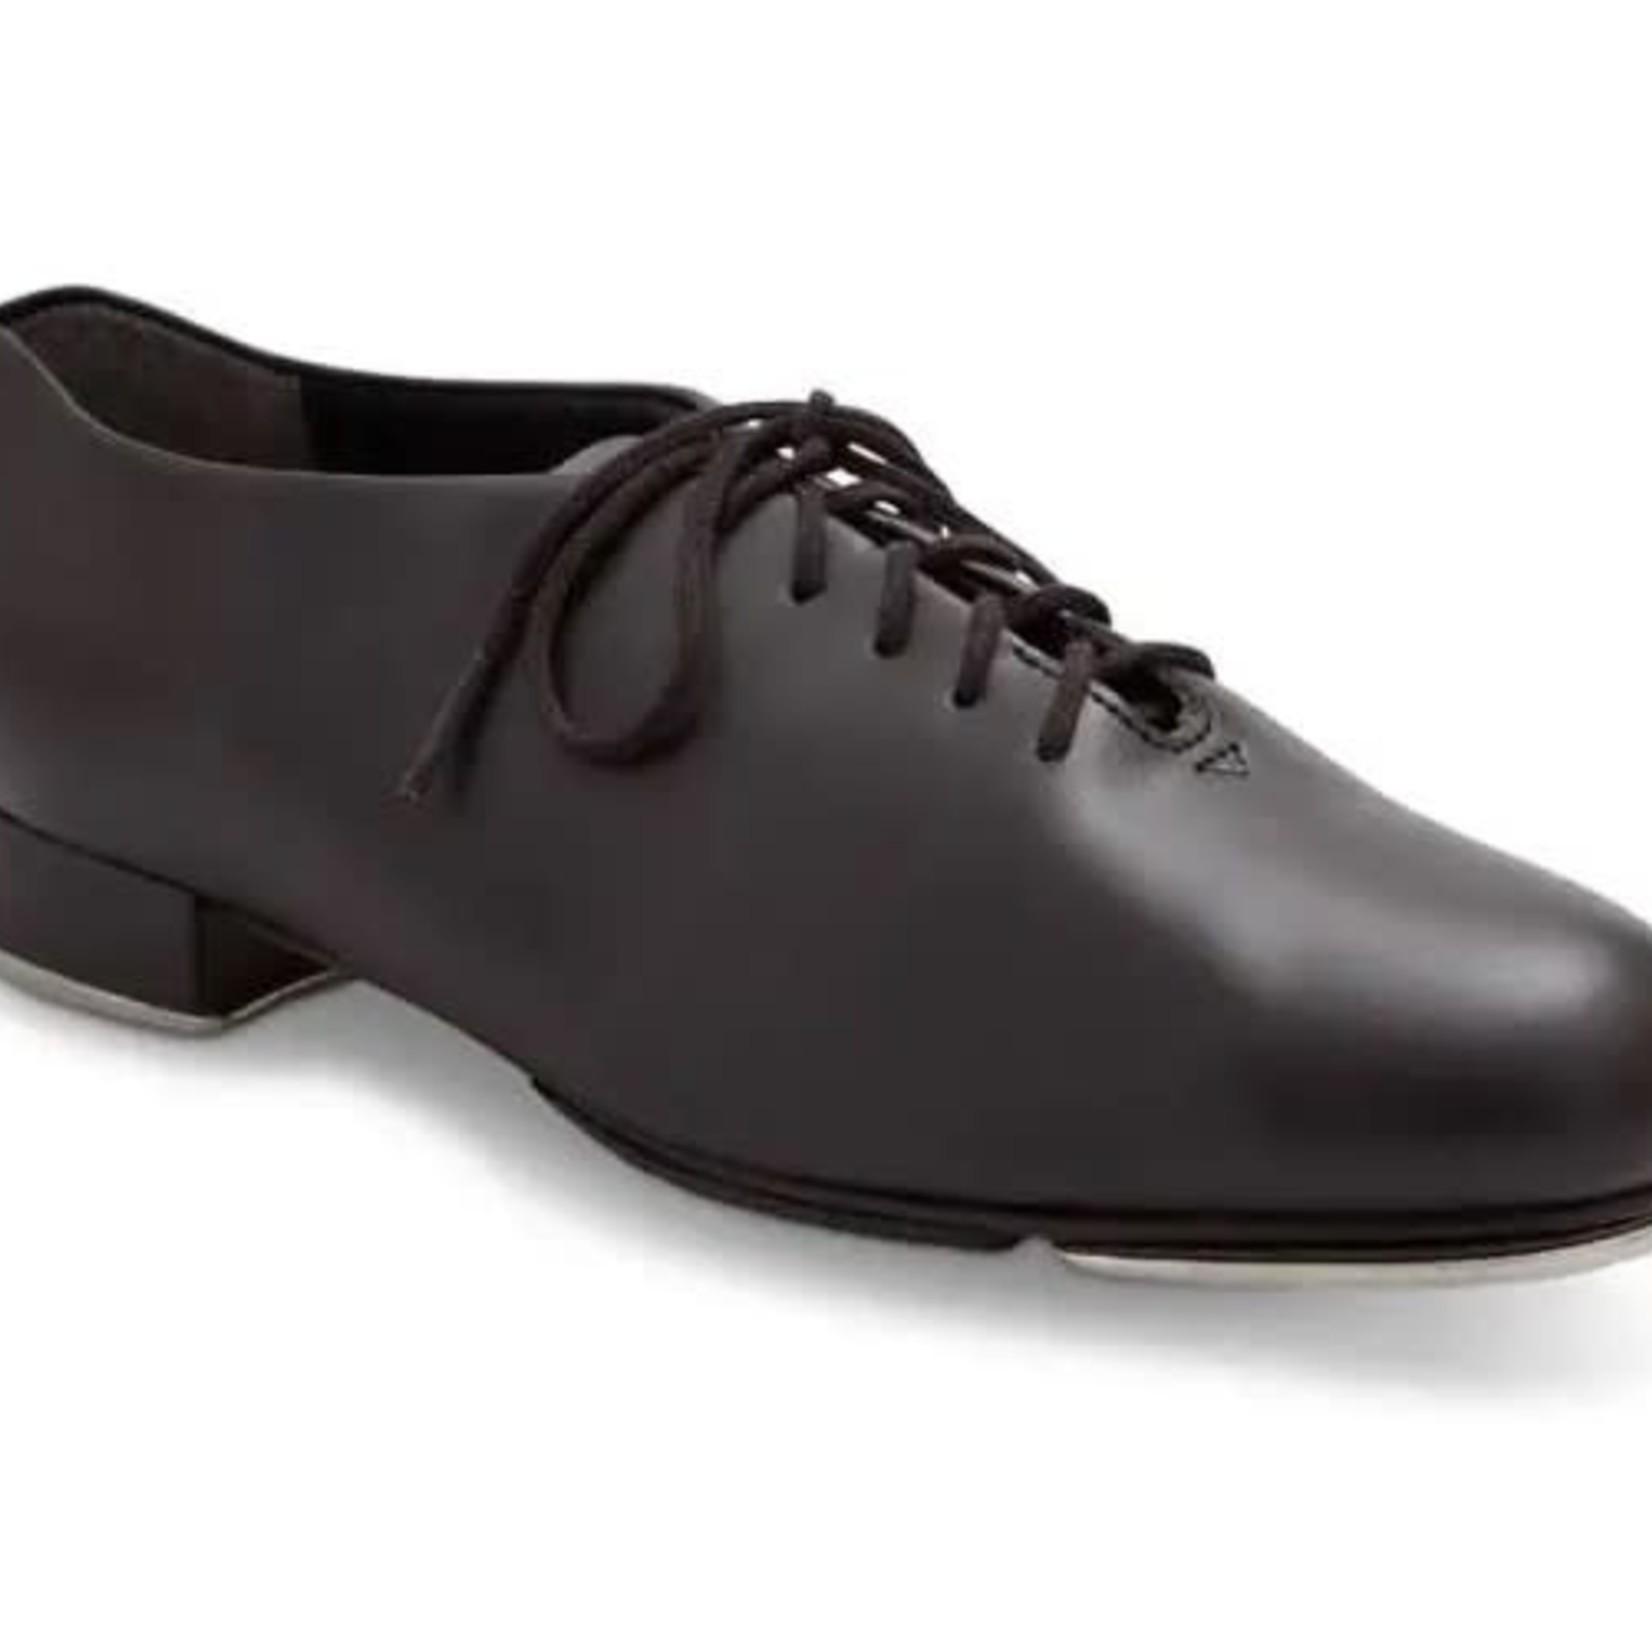 Capezio Capezio 443 Adult Tic Tap Toe Shoe